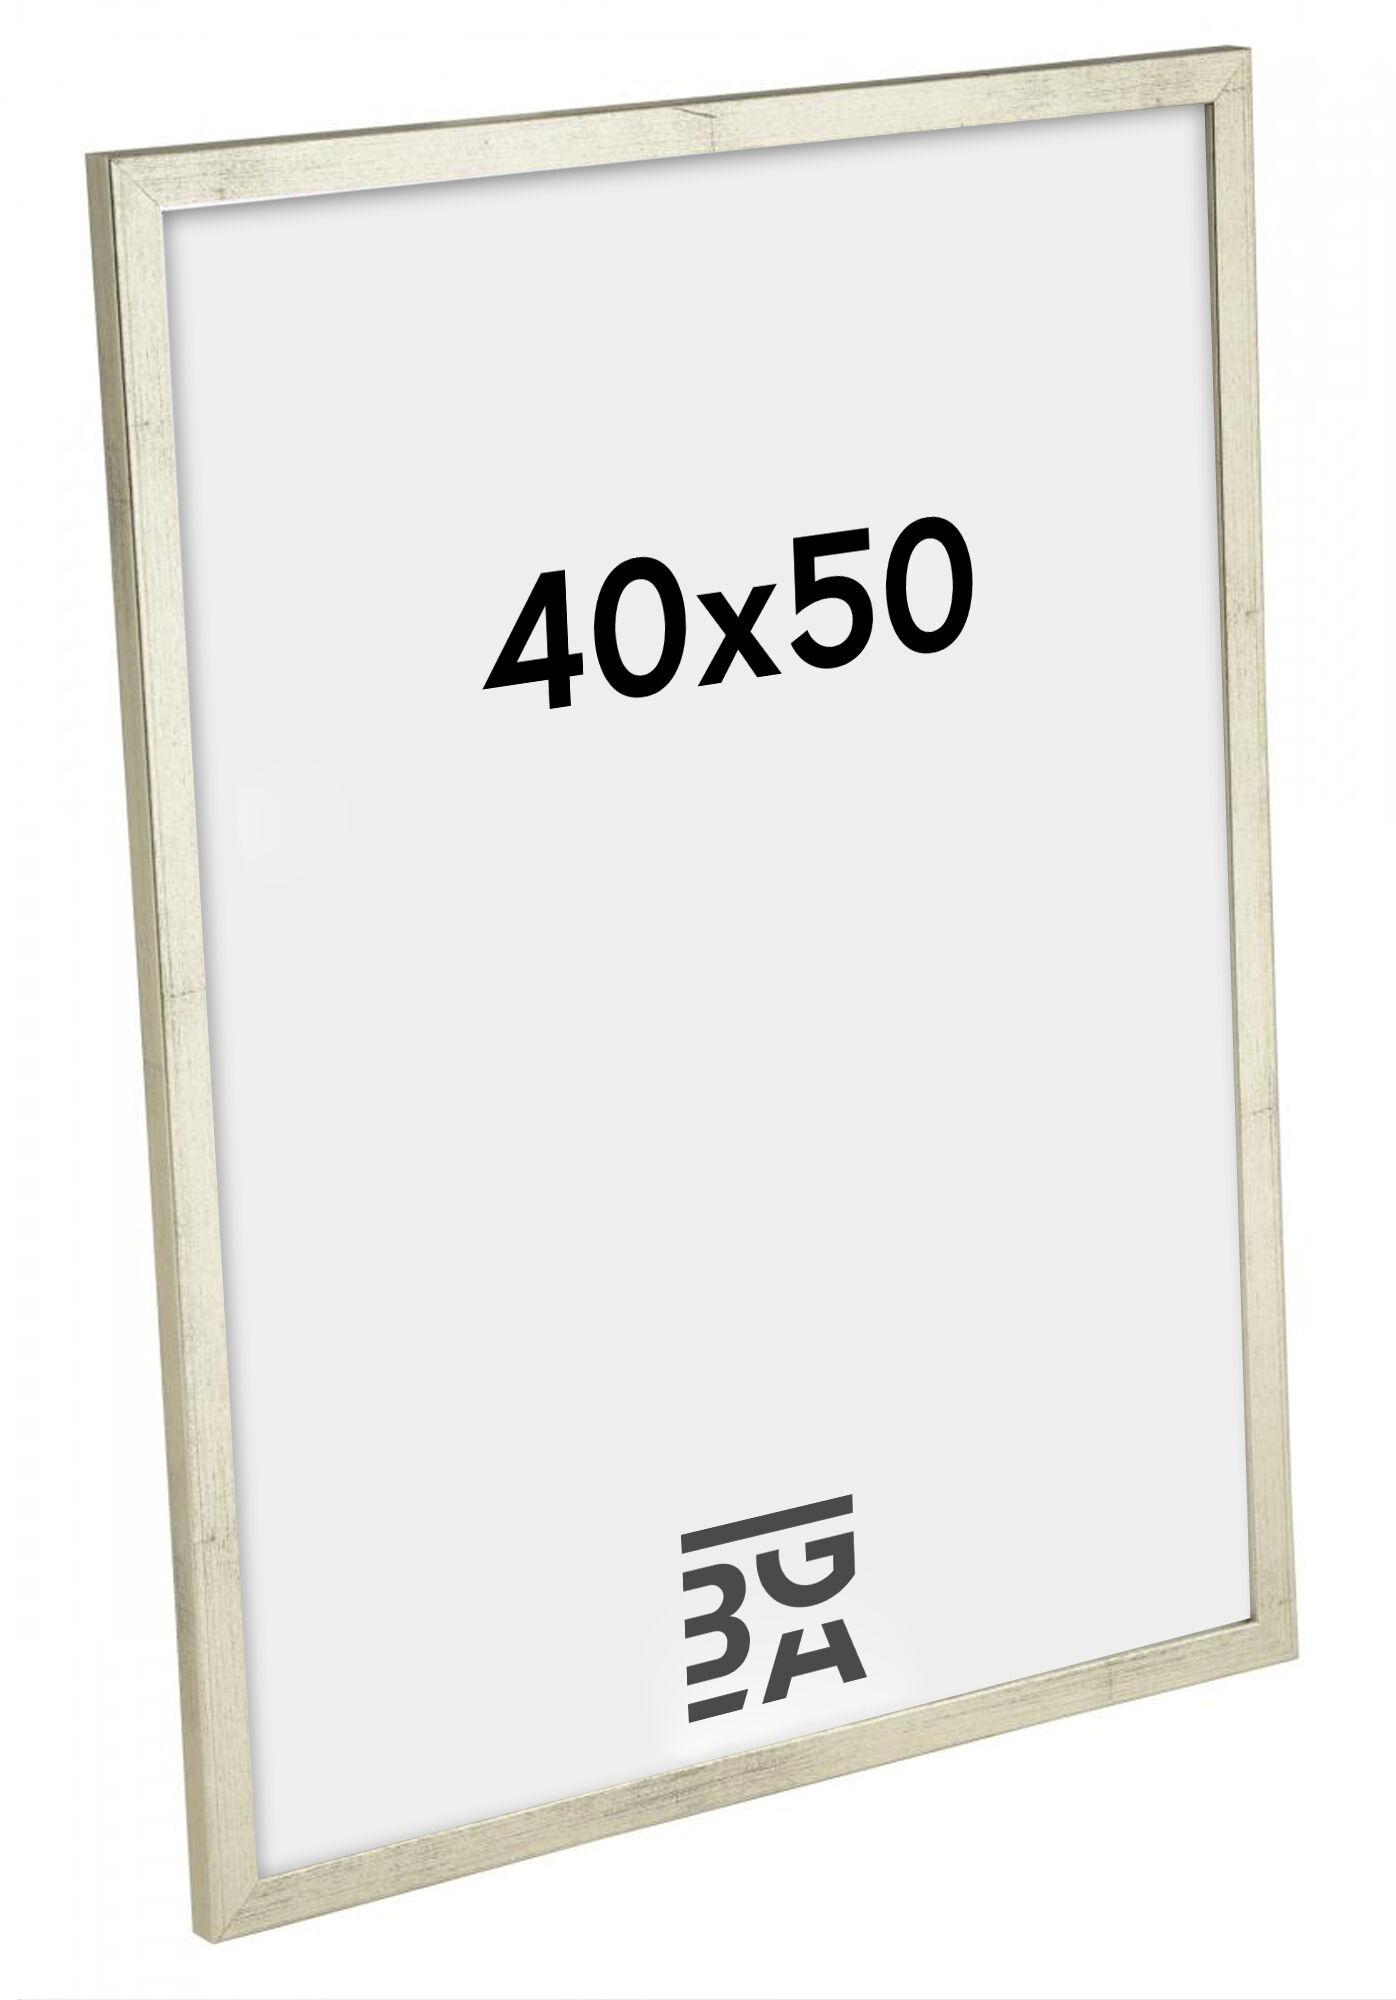 Estancia Galant Pleksilasi Hopeanvärinen 40x50 cm